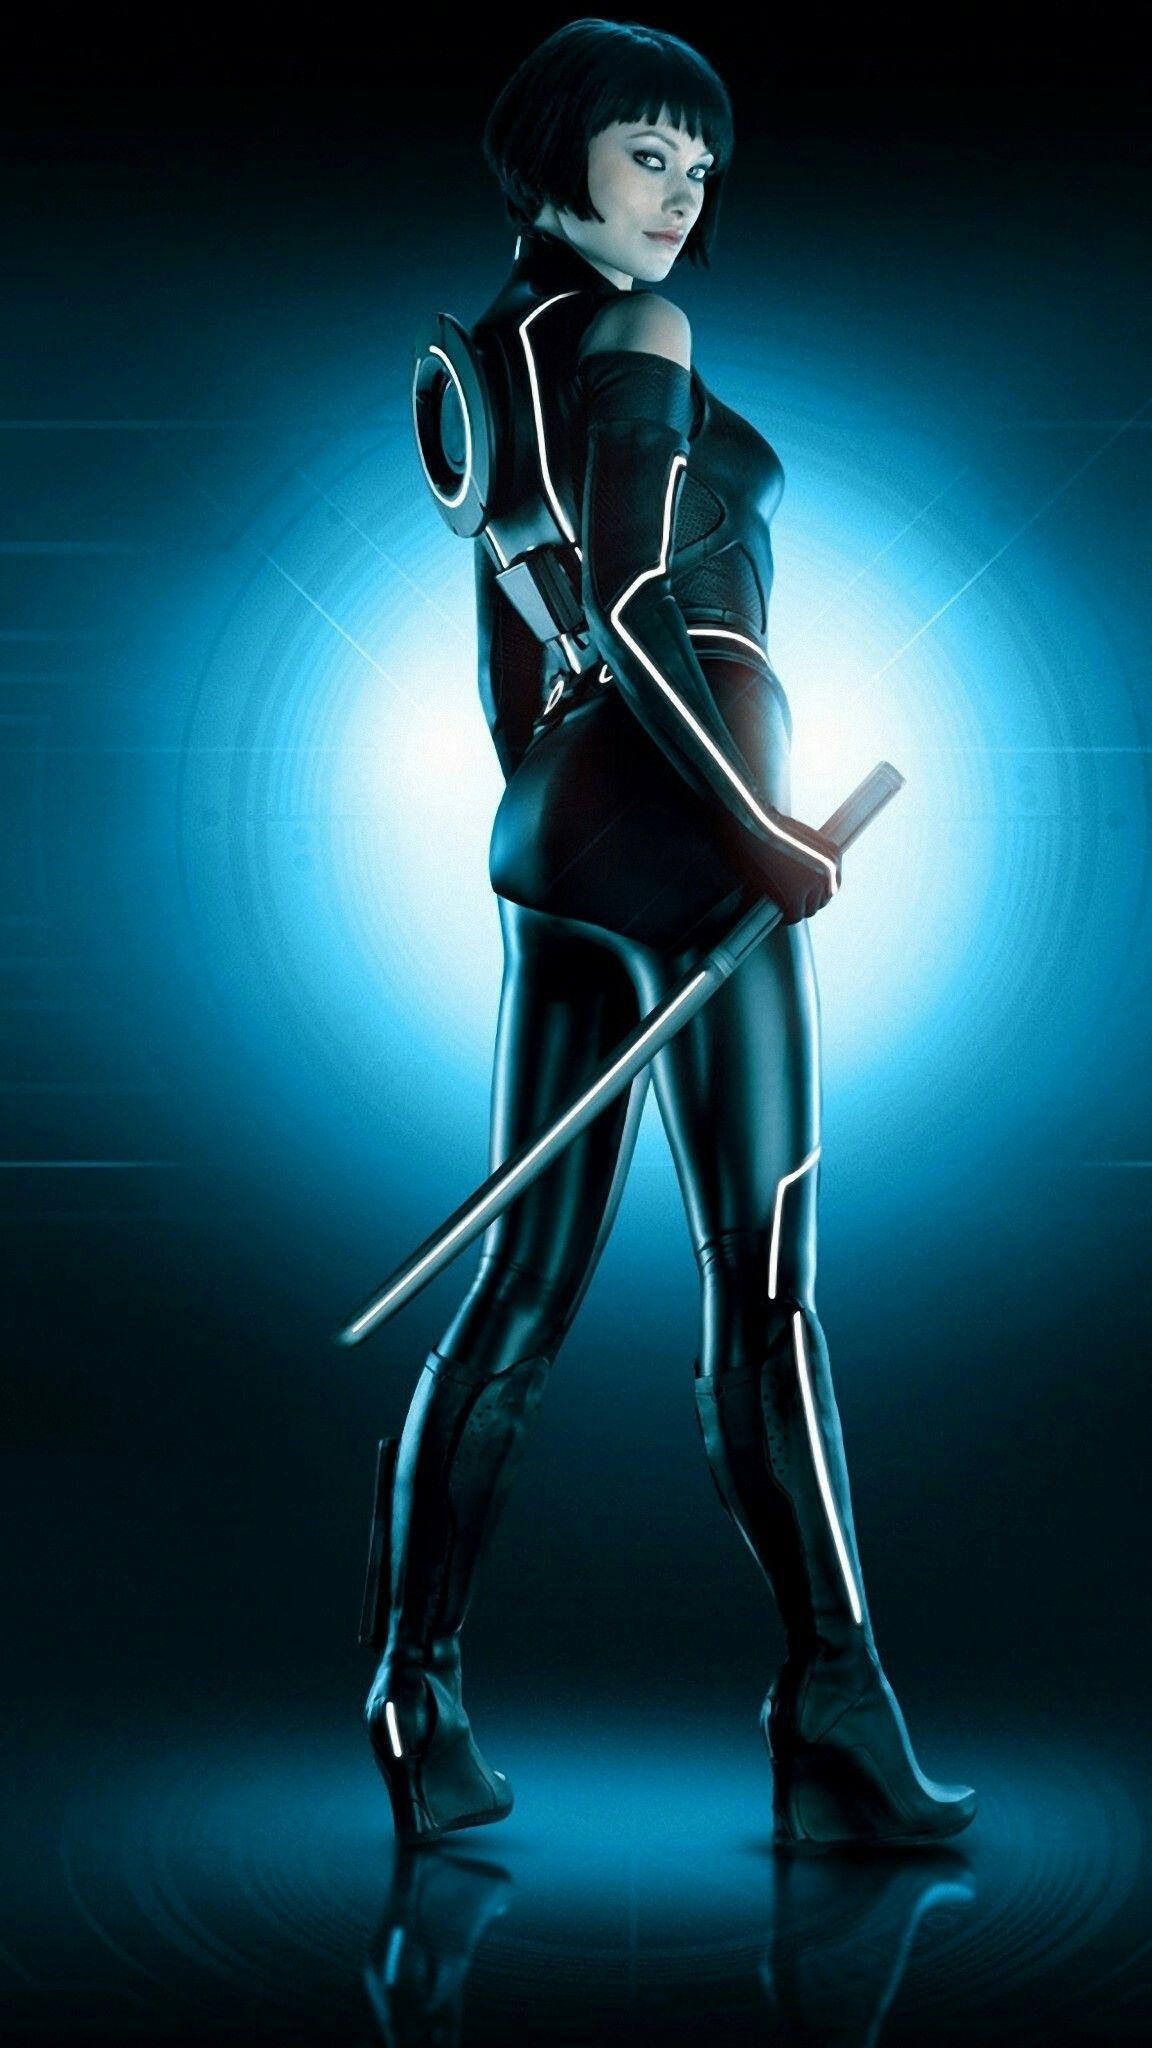 Pin By Brad Billings On Duvido Mexer Com Elas Olivia Wilde Tron Tron Legacy Tron